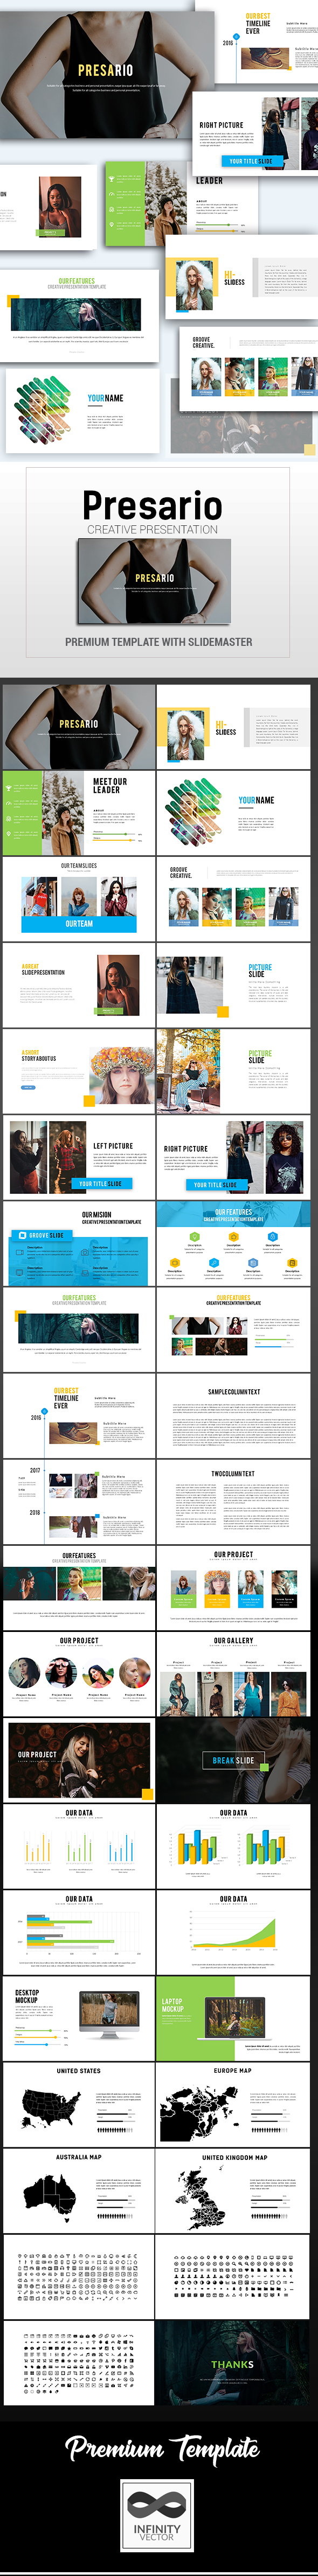 Presario Creative Presentation Google Slide - Google Slides Presentation Templates